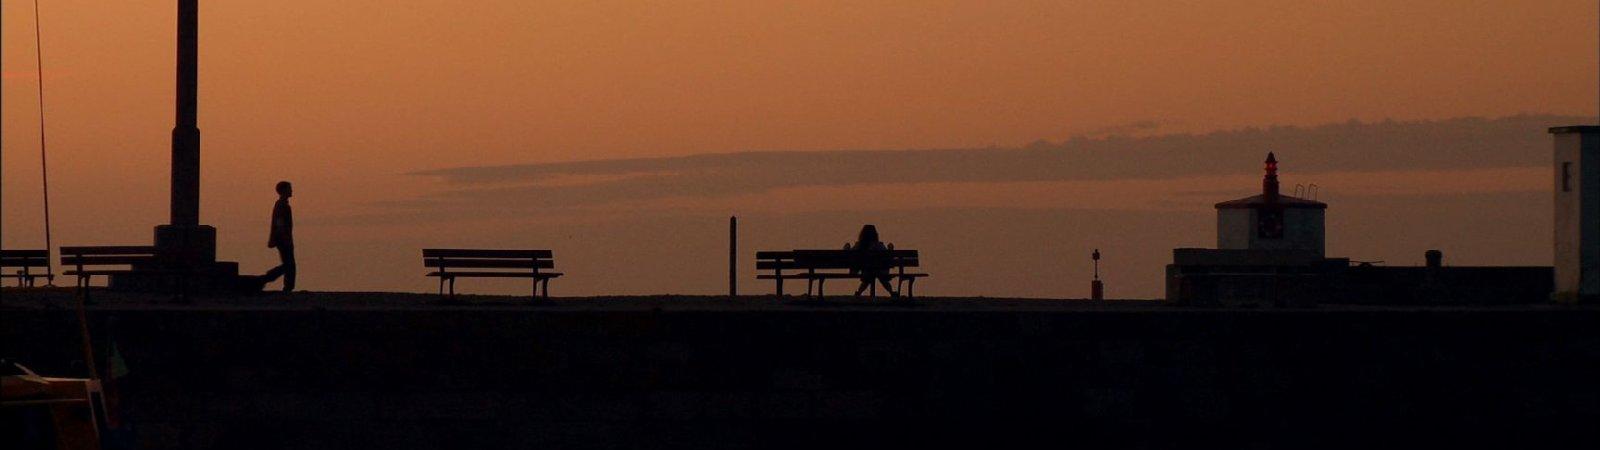 Photo dernier film Laurent Bouhnik